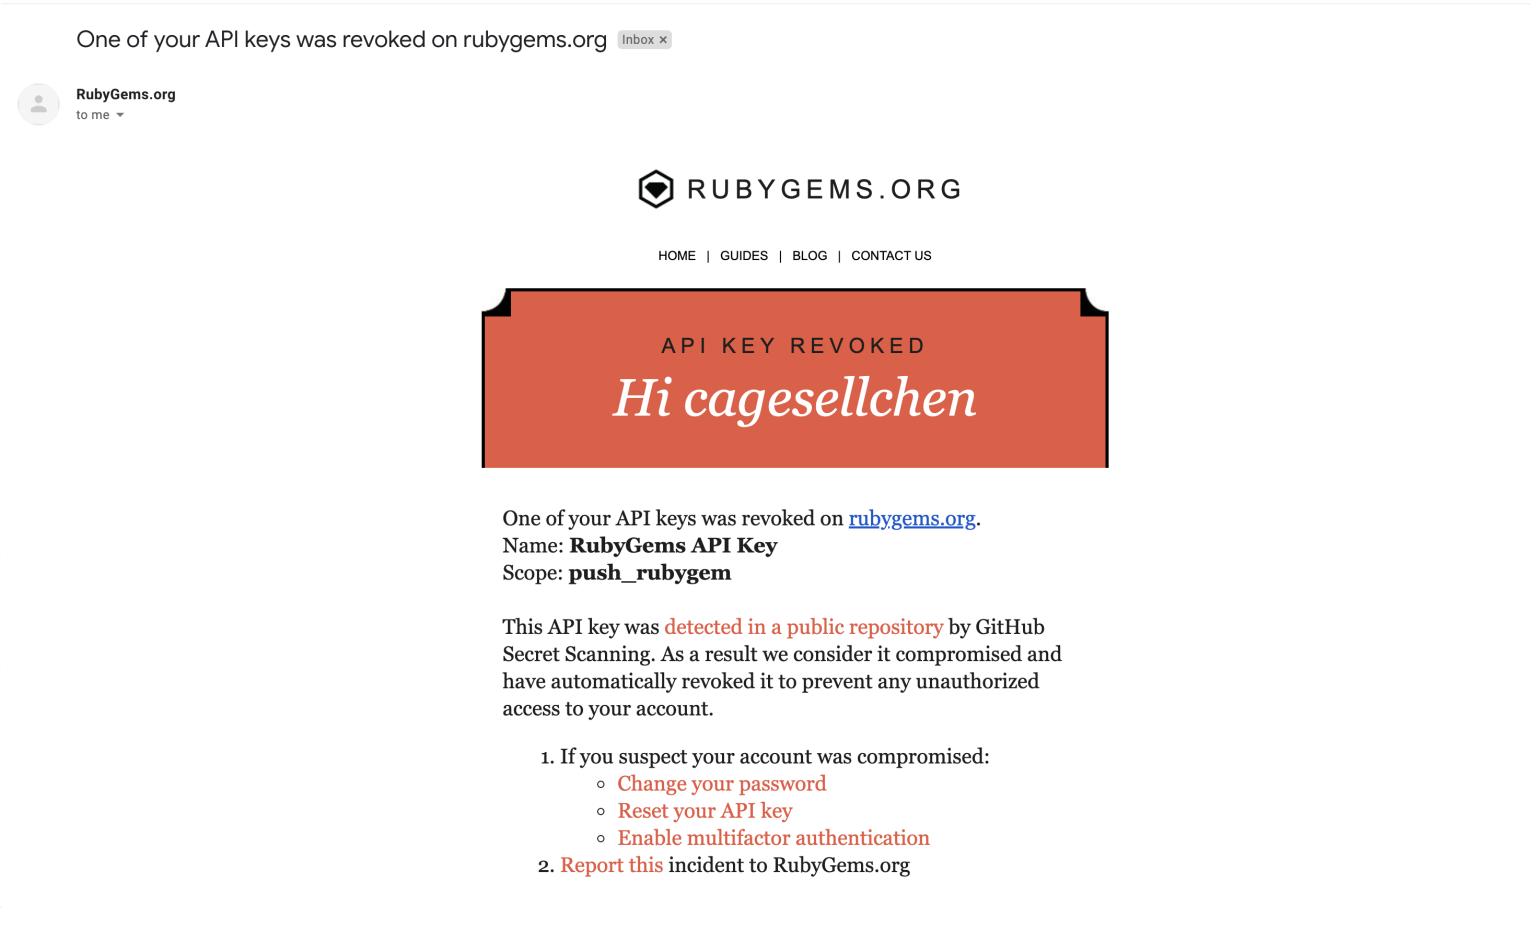 GitHub 机密扫描现在支持 PyPI 和 RubyGems